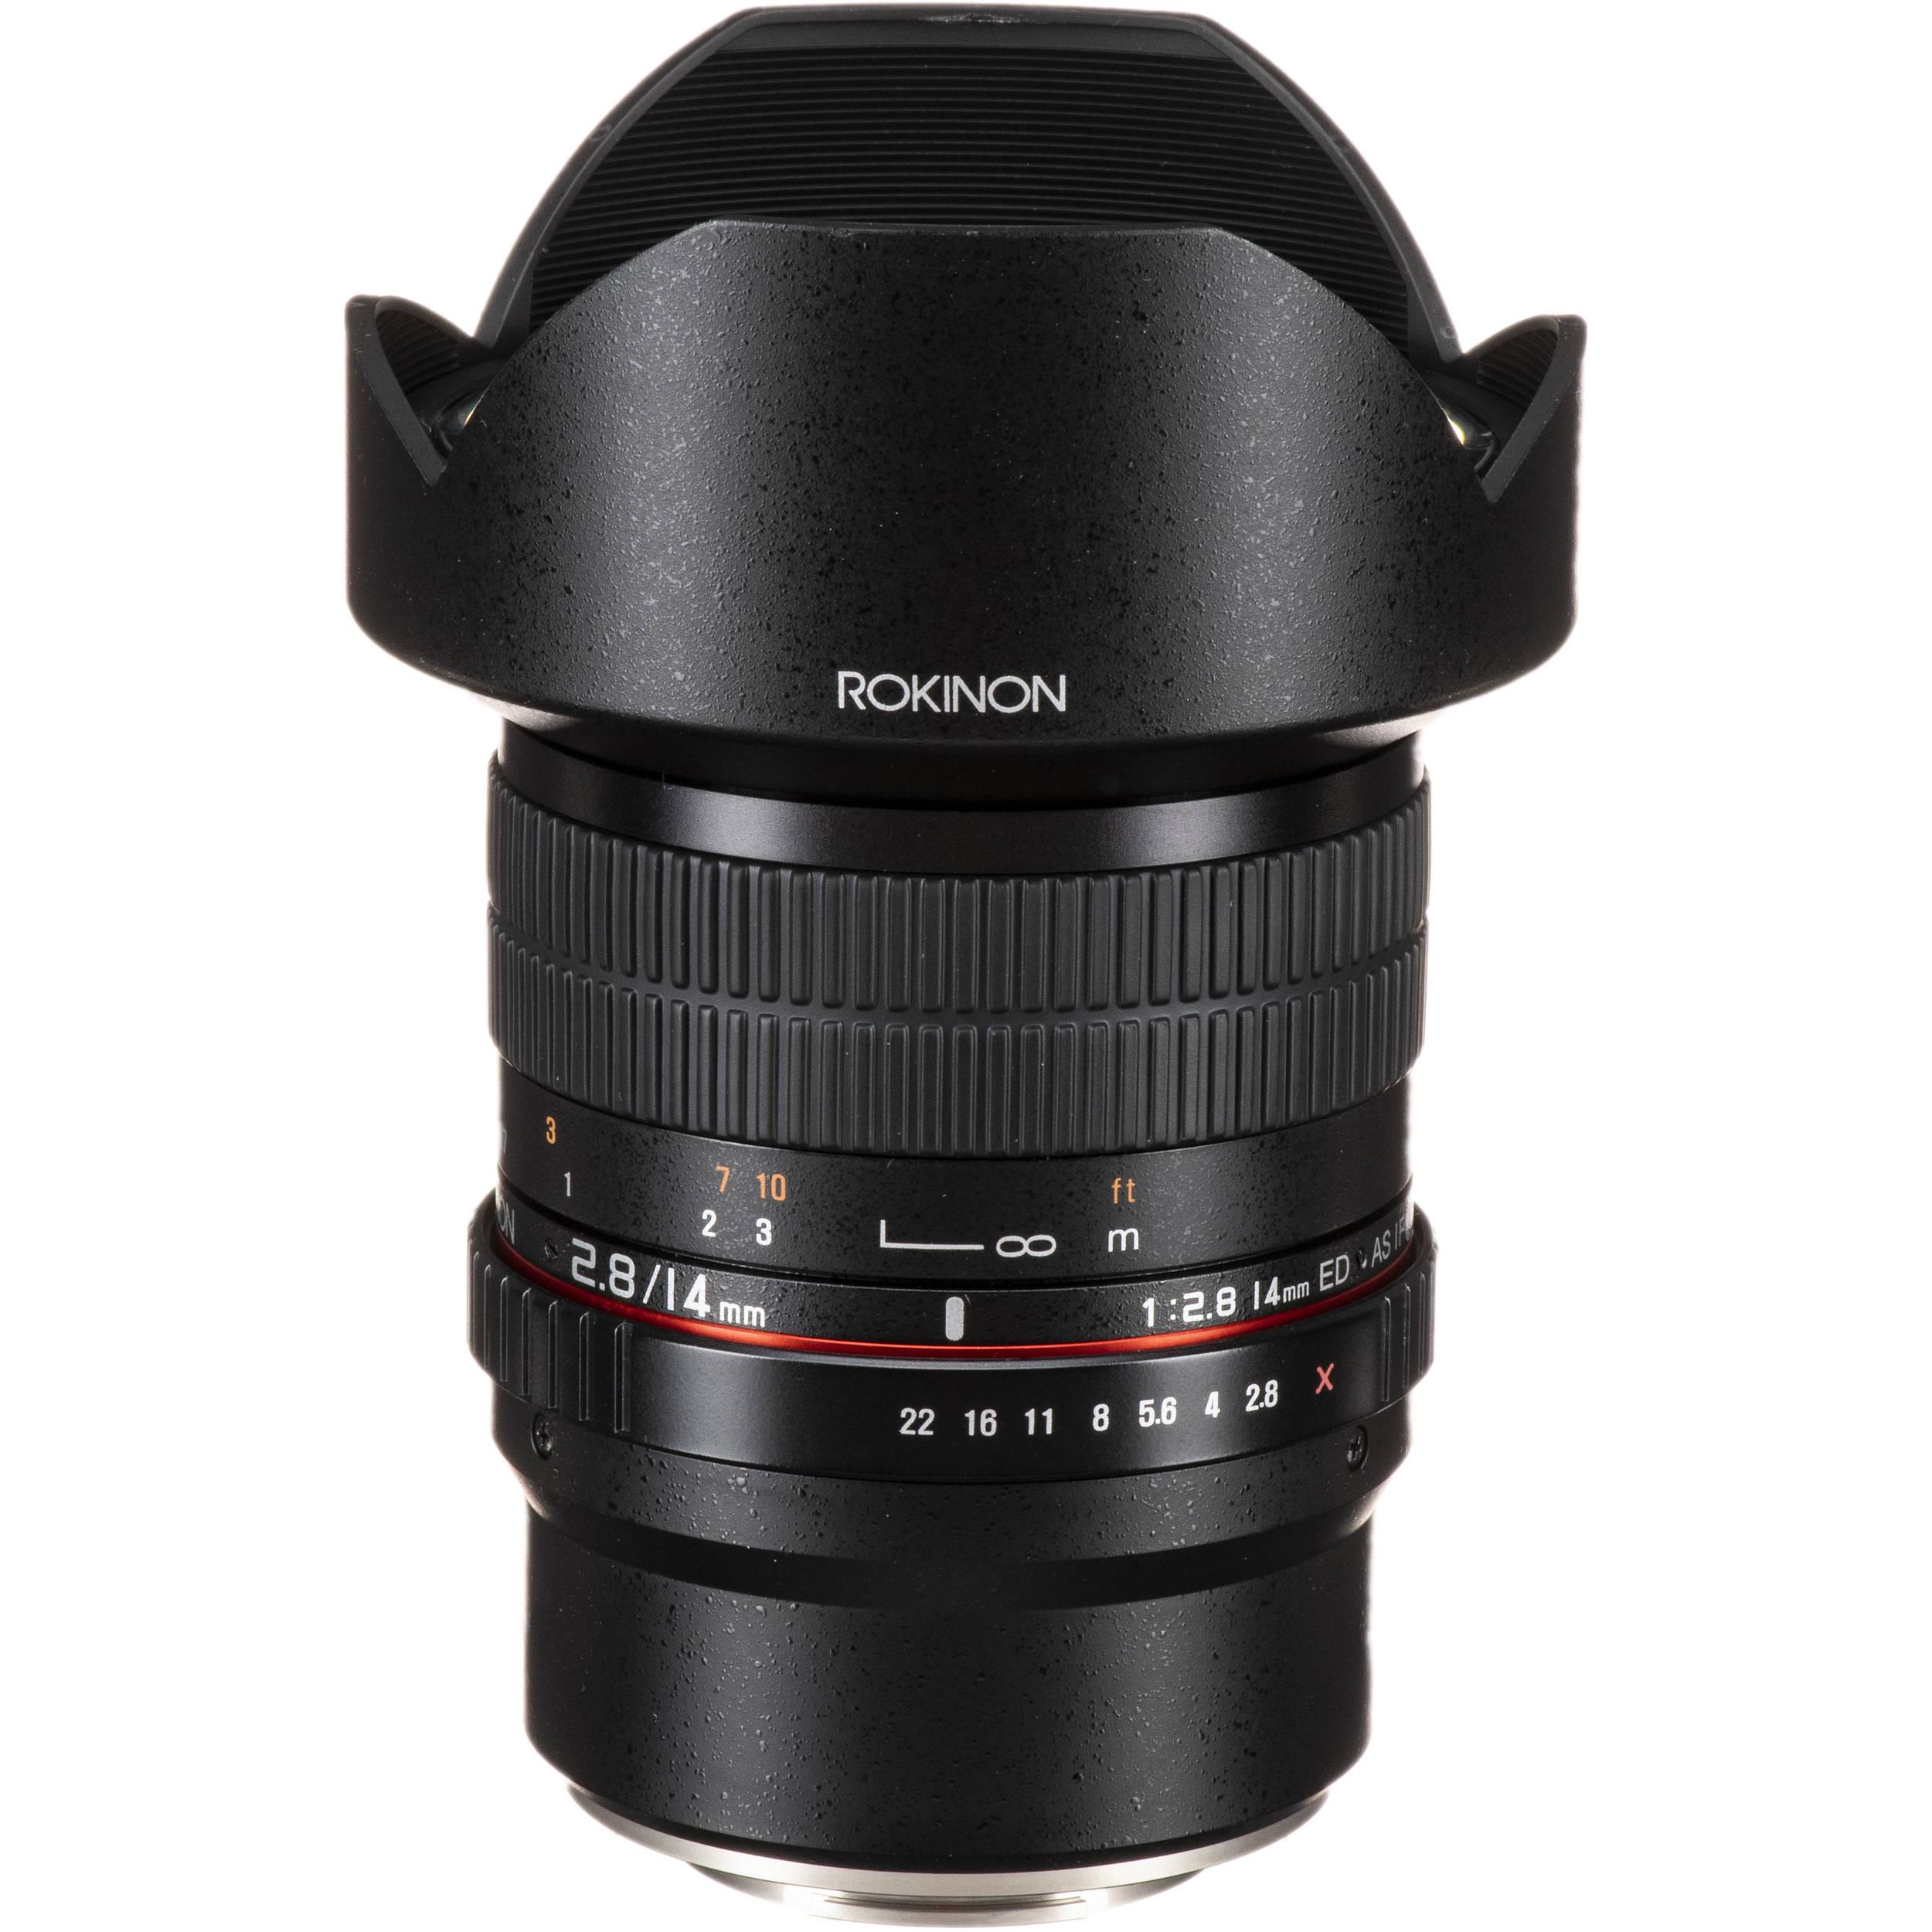 Rokinon 14mm f/2 8 ED AS IF UMC Lens for Fujifilm X Mount